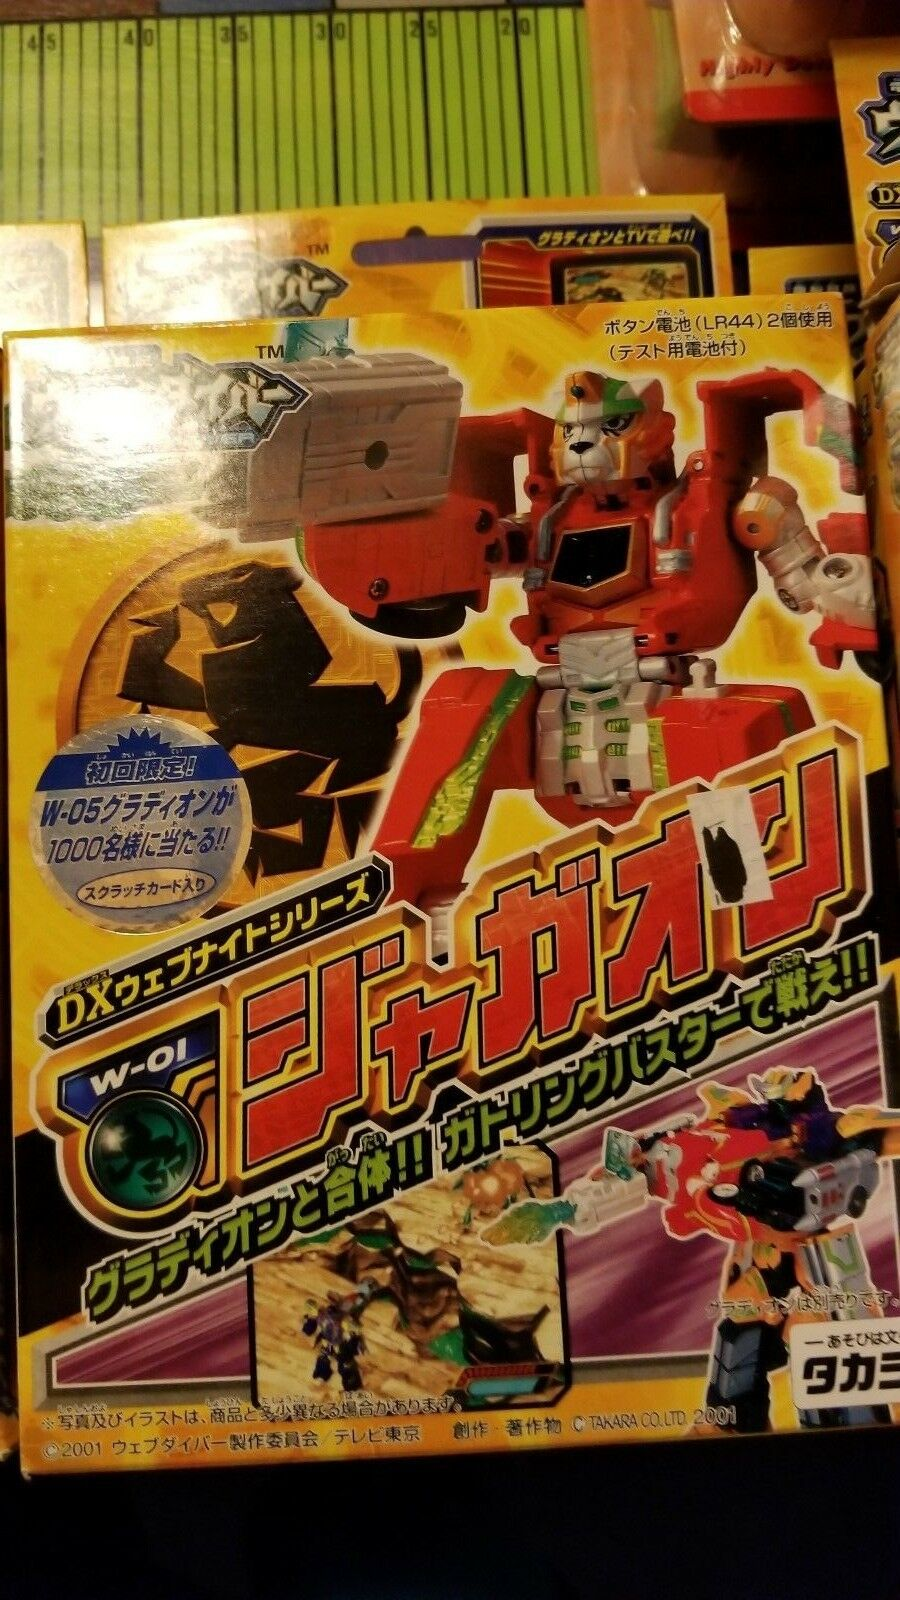 Takara Webdiver Jaguaron complete Web Diver (transformers) action figure W-01